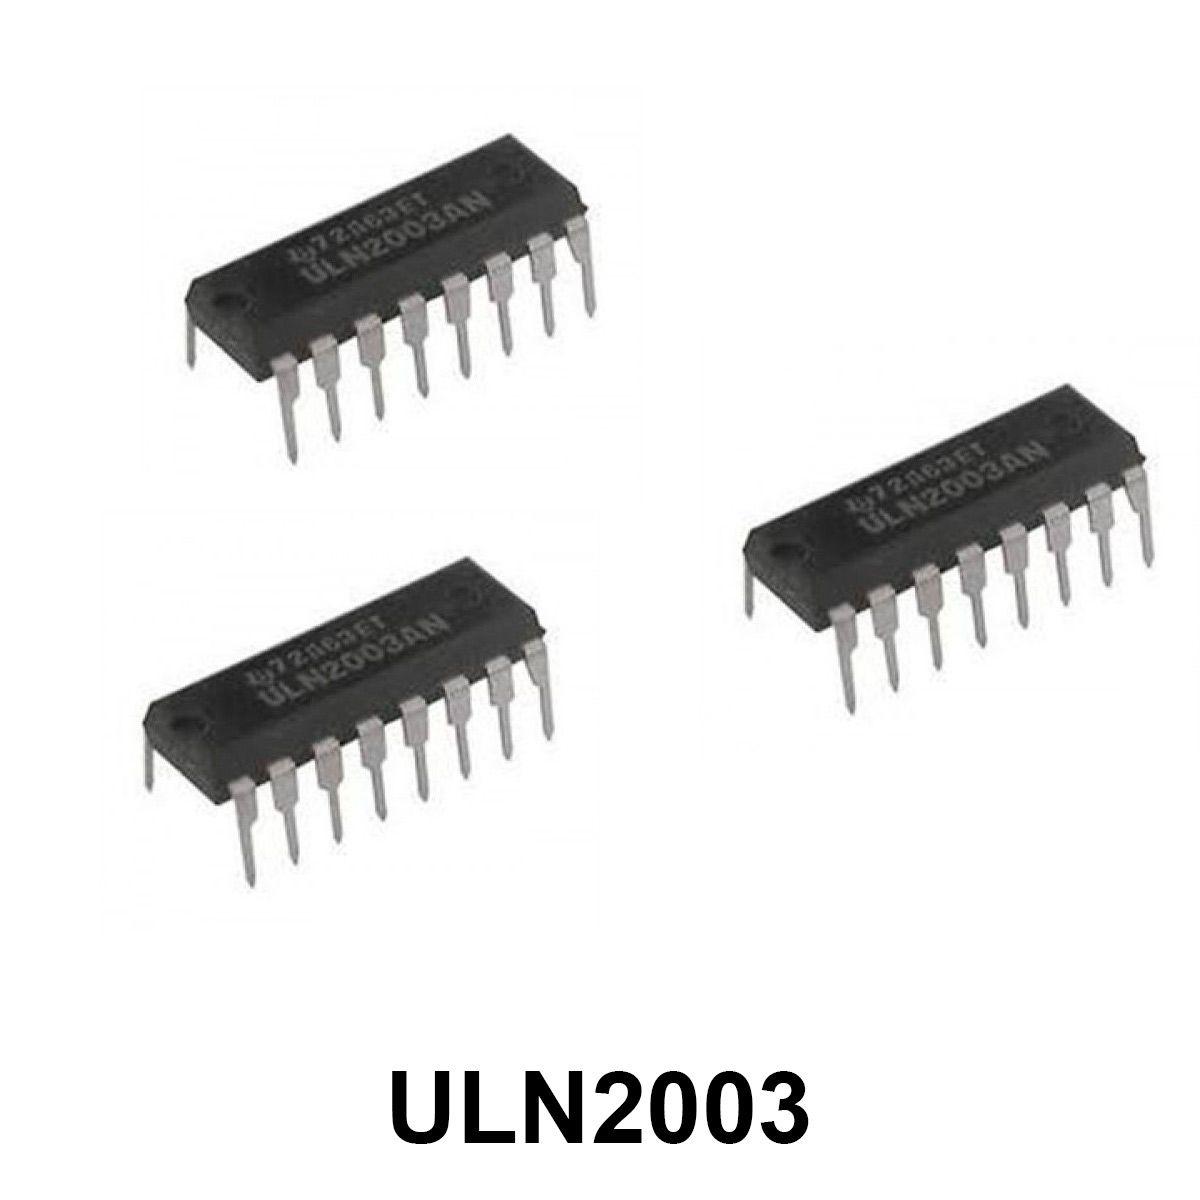 3x Circuito Integrado ULN2003 ULN 2003 Ponte H - 7 canais 500mA